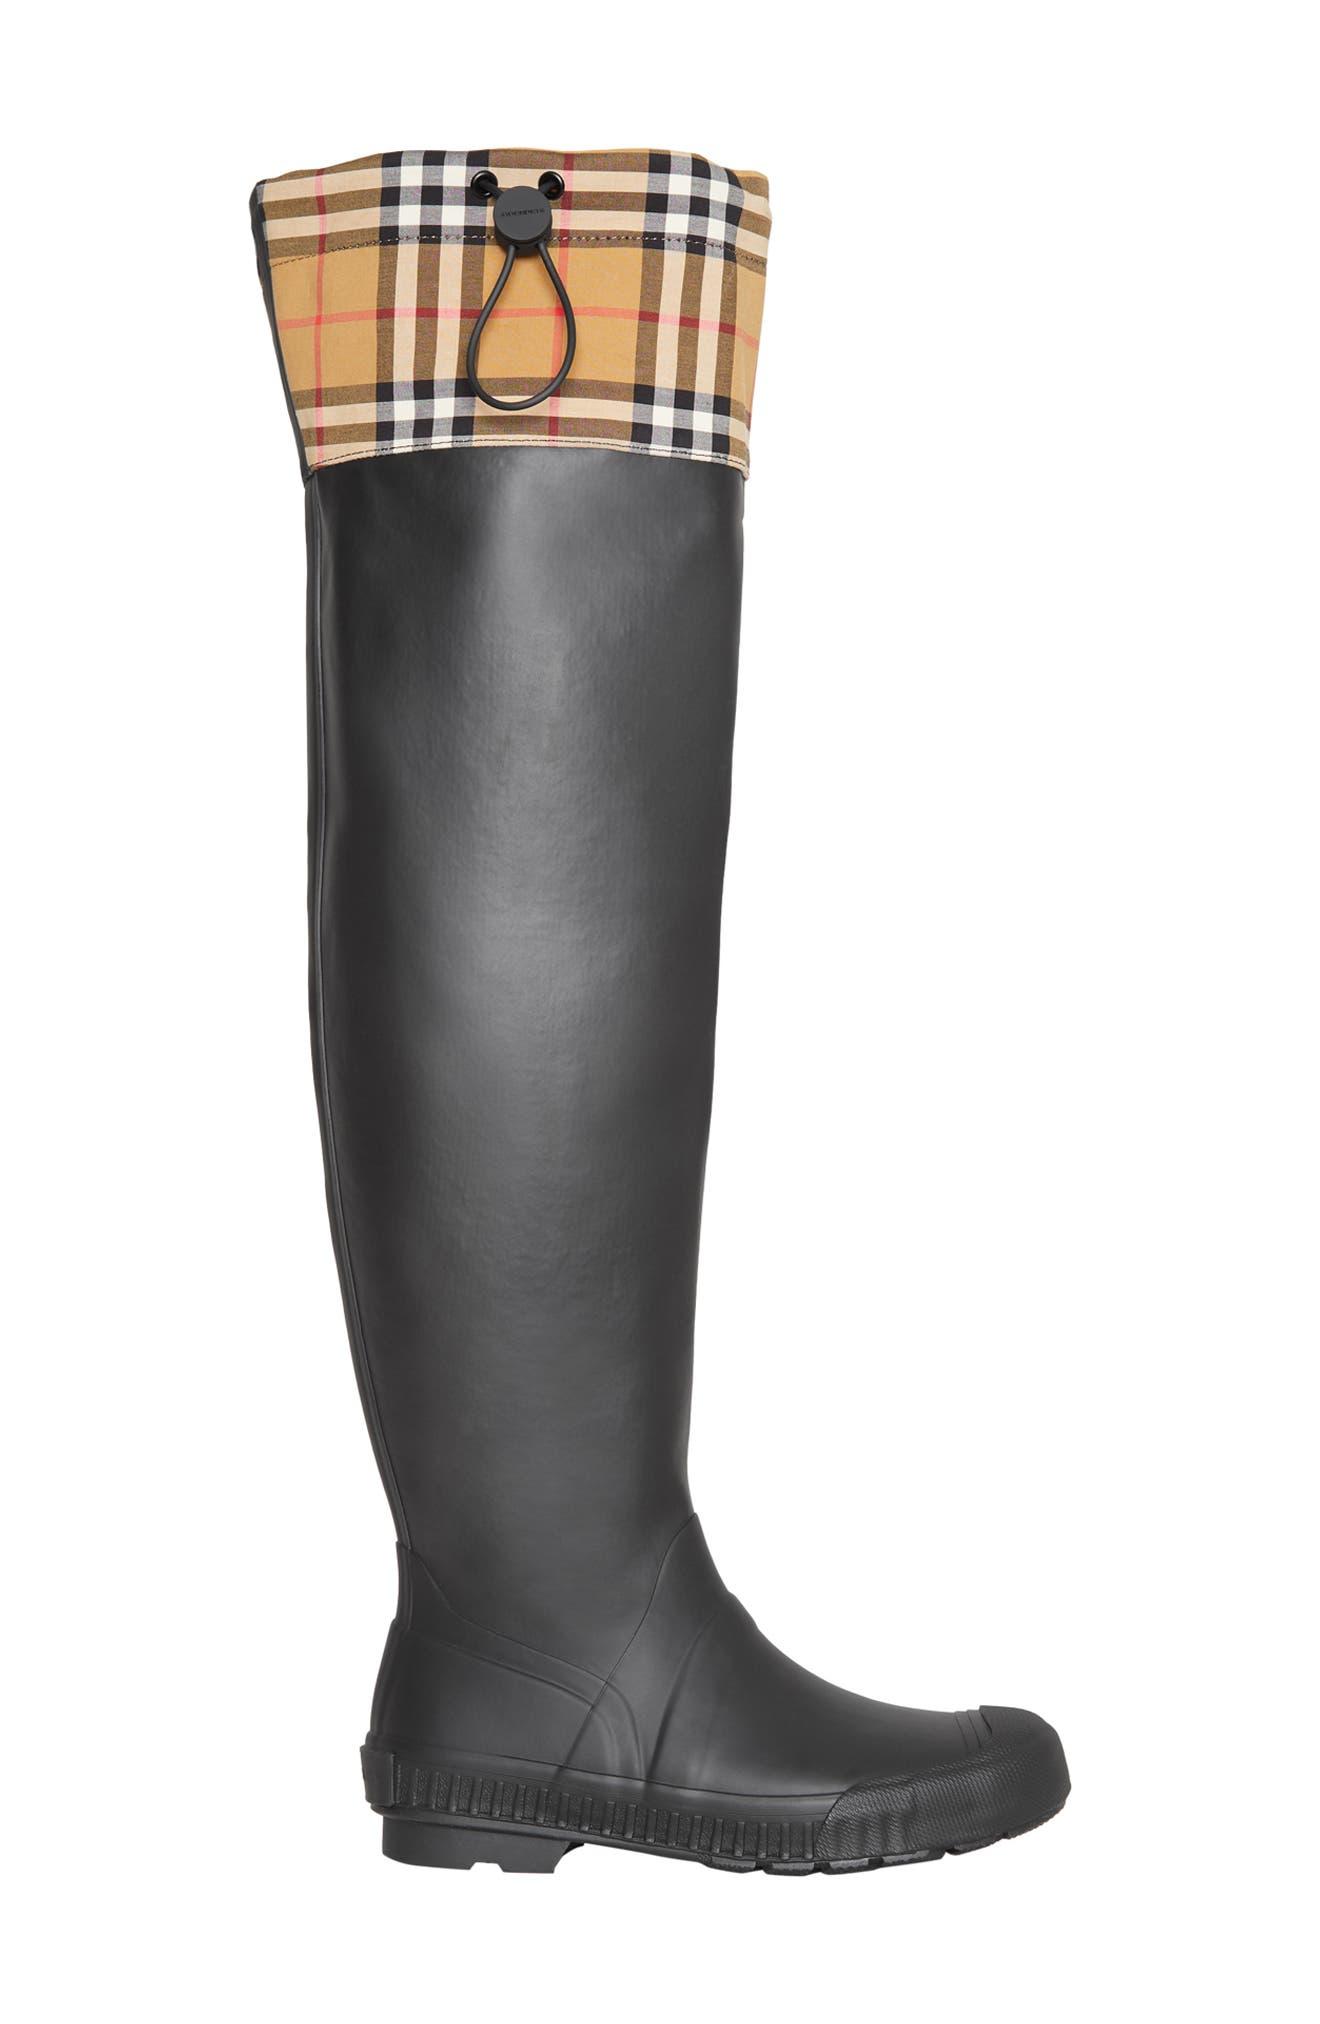 BURBERRY,                             Freddie Tall Waterproof Rain Boot,                             Alternate thumbnail 2, color,                             BLACK